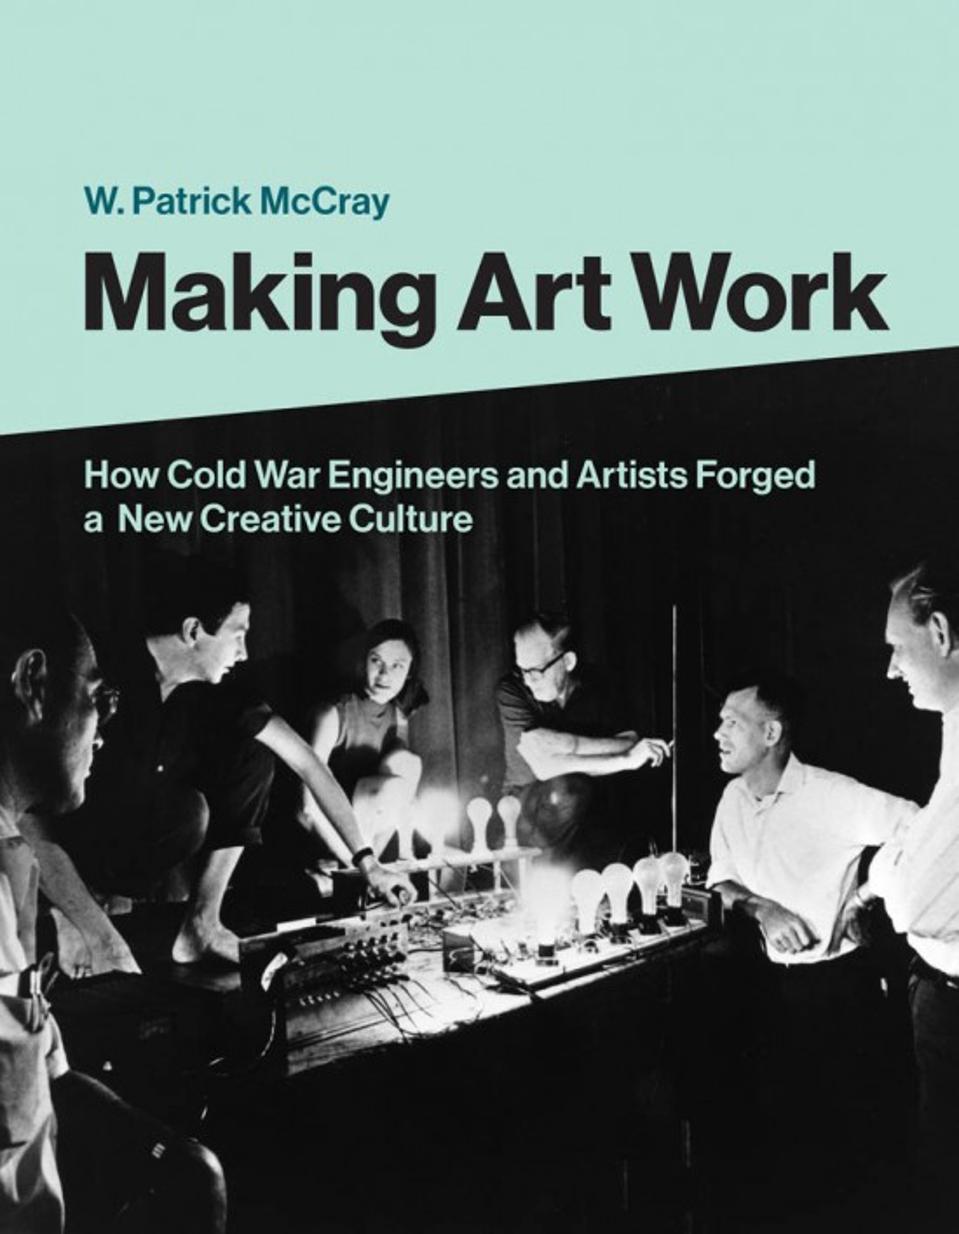 Making Art Work, by W. Patrick McCray (MIT Press)